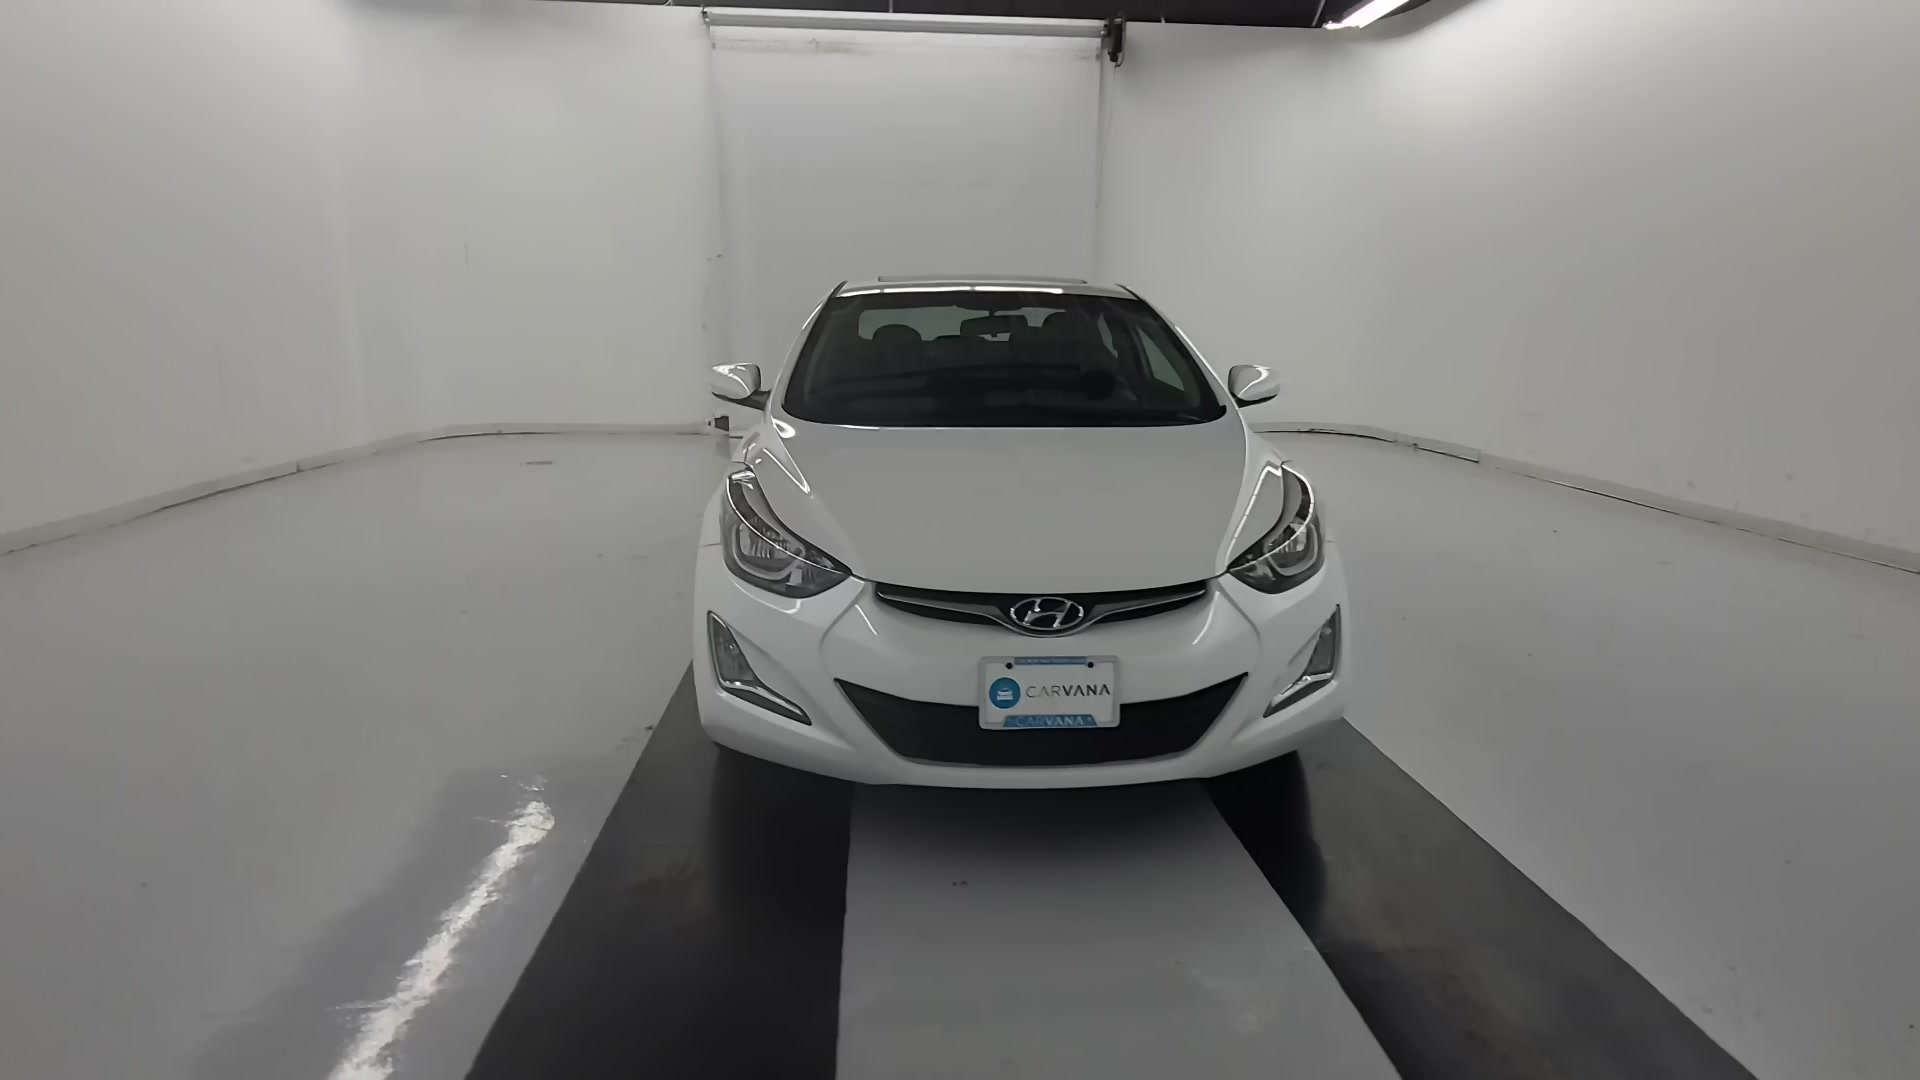 2016 Hyundai Elantra Hayward CA